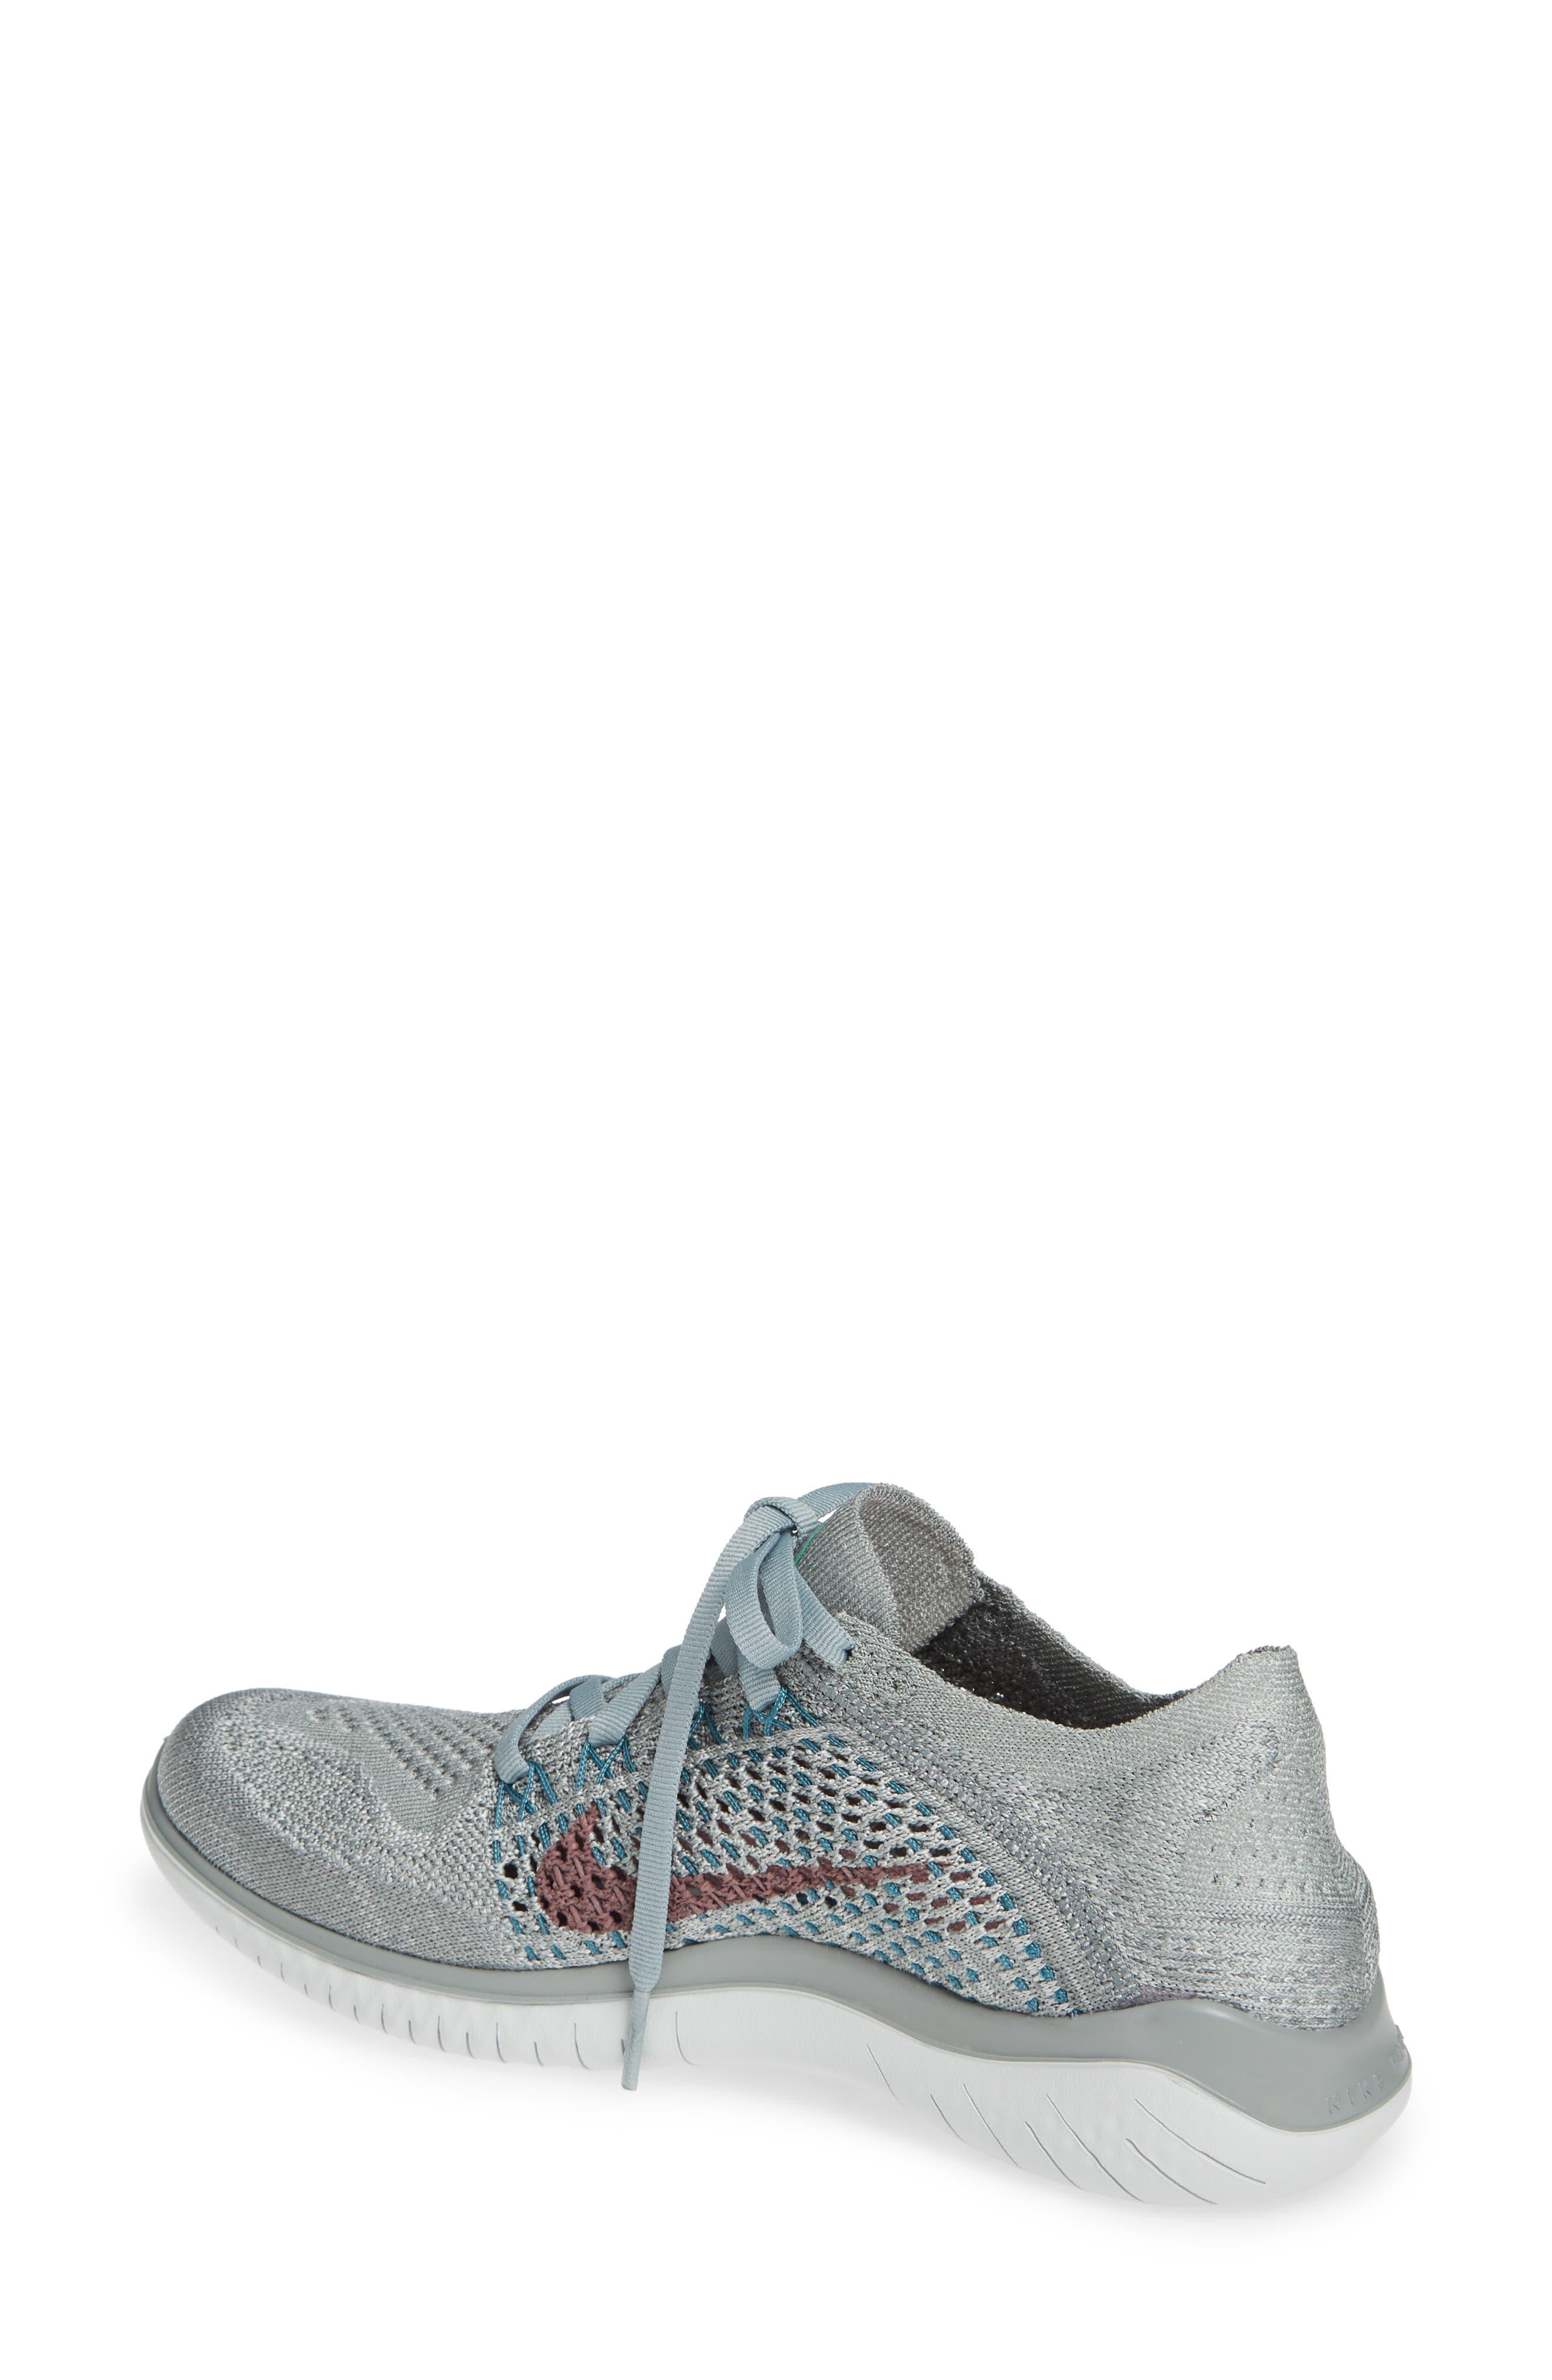 NIKE, Free RN Flyknit 2018 Running Shoe, Alternate thumbnail 2, color, 300